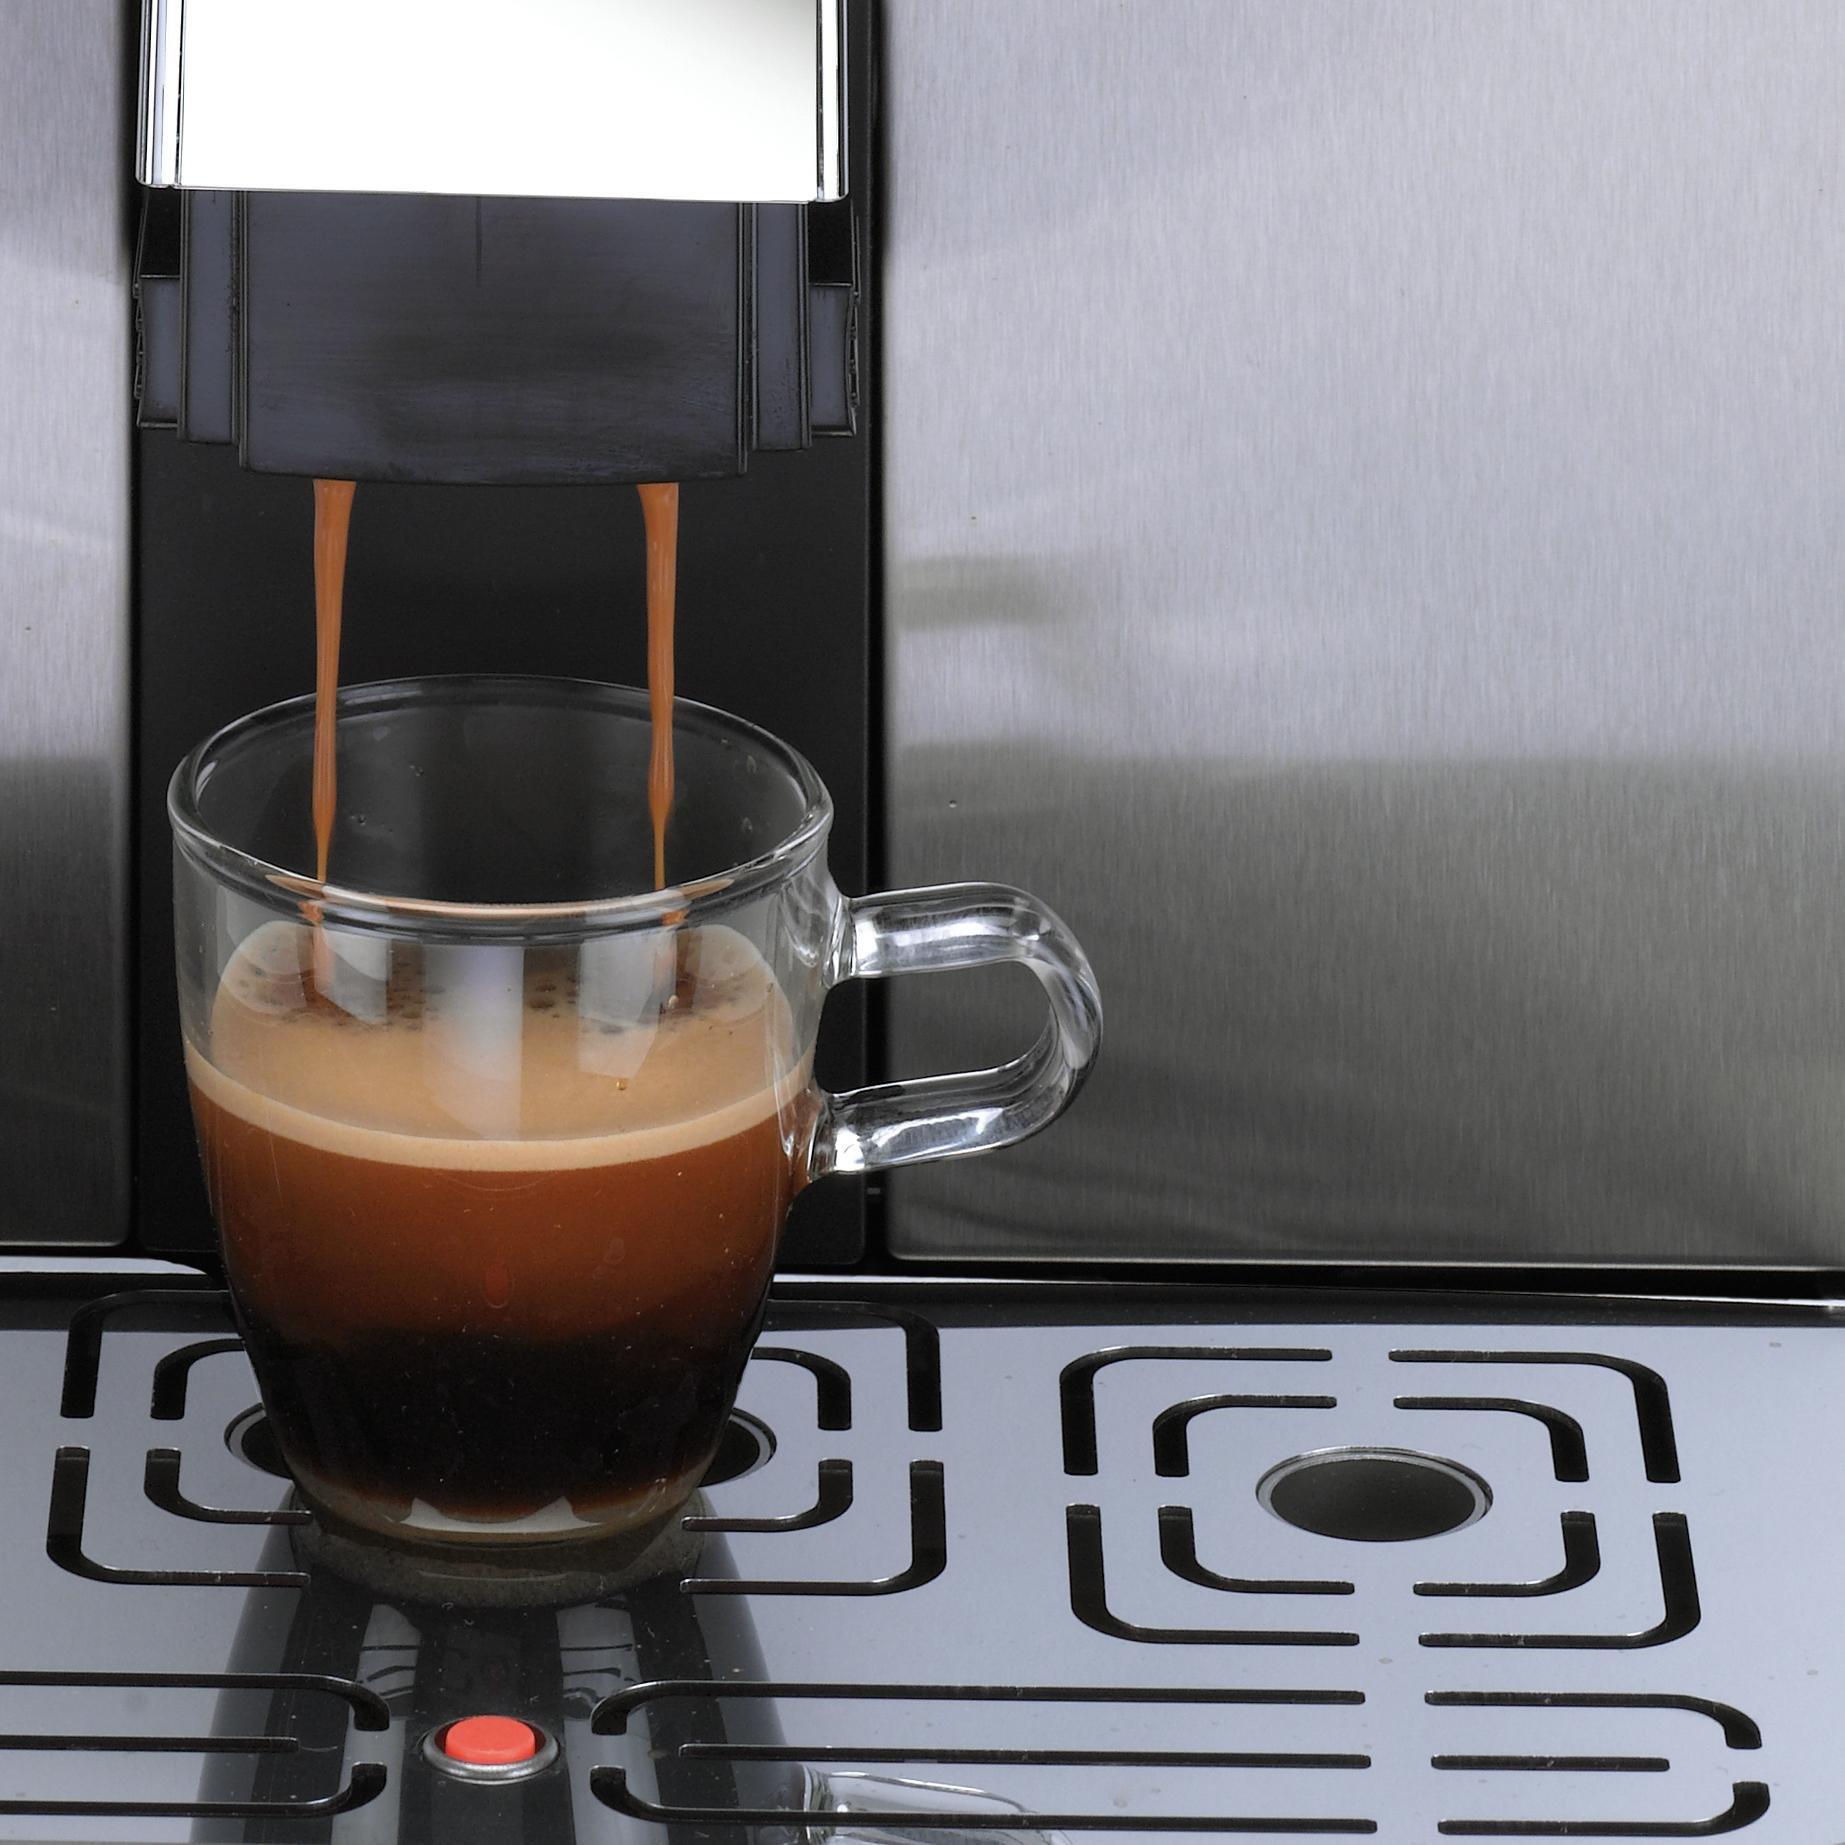 Gaggia Brera Super Automatic Espresso Machine in Silver. Pannarello Wand Frothing for Latte and Cappuccino Drinks. Espresso from Pre-Ground or Whole Bean Coffee. by Gaggia (Image #10)